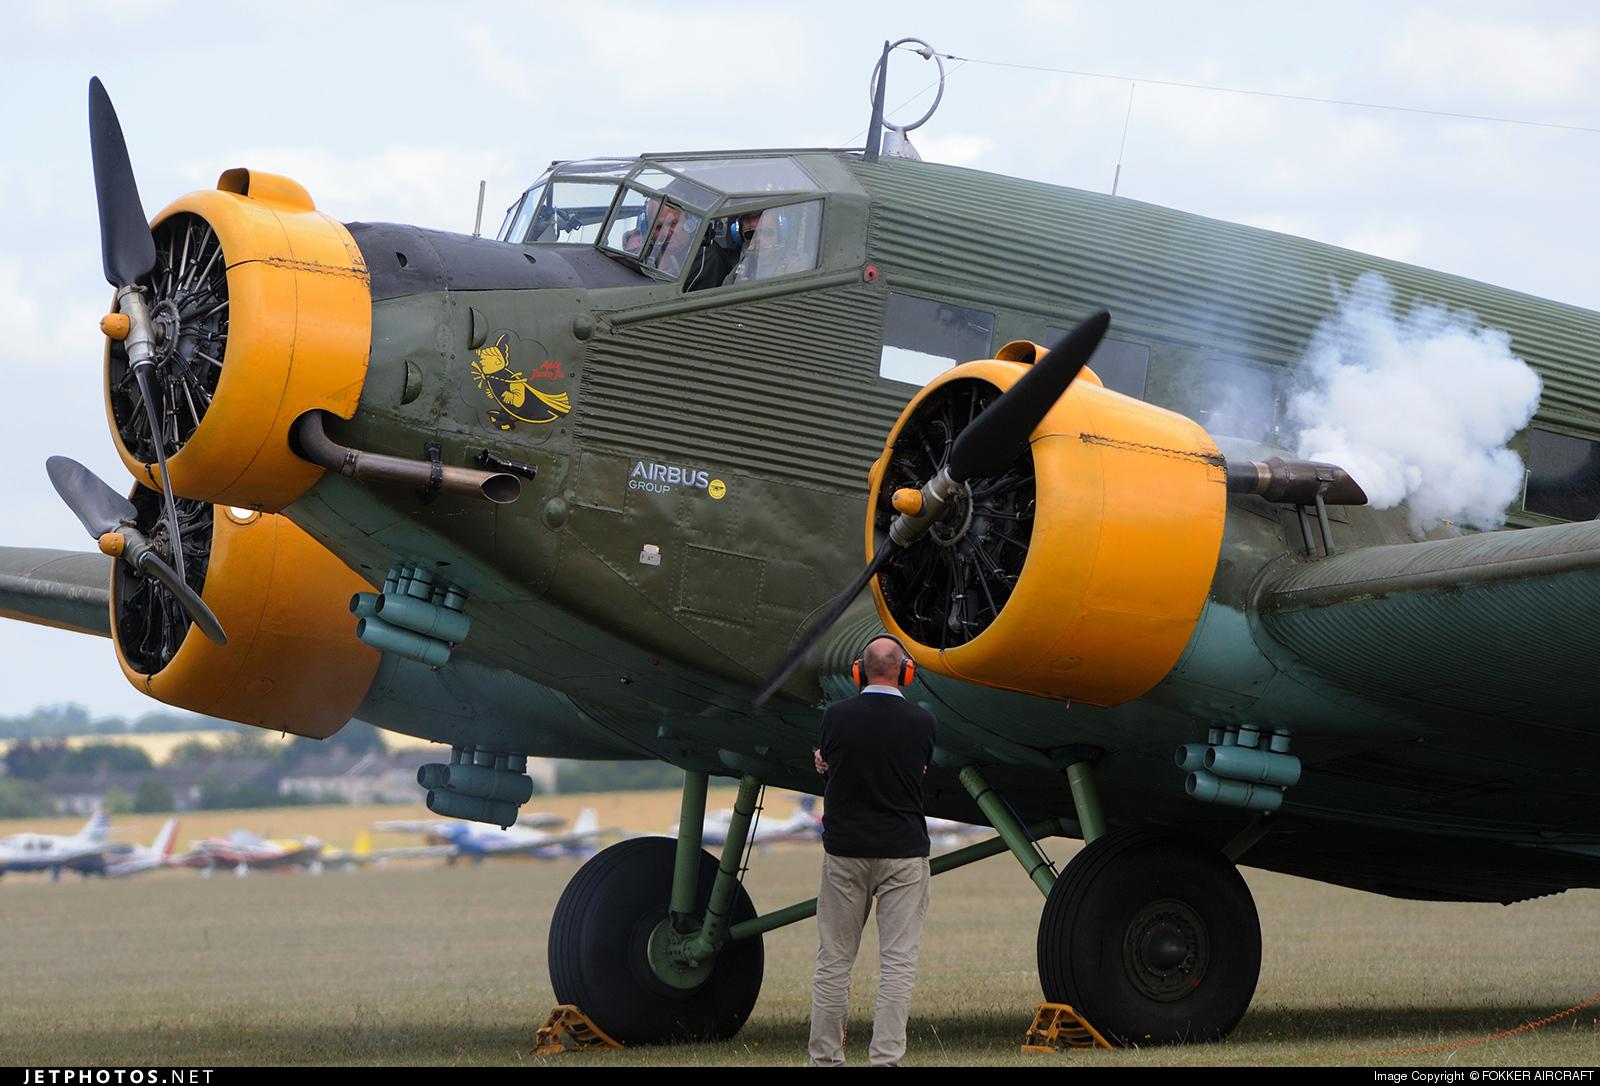 Junkers Ju 52 - Wikipedia